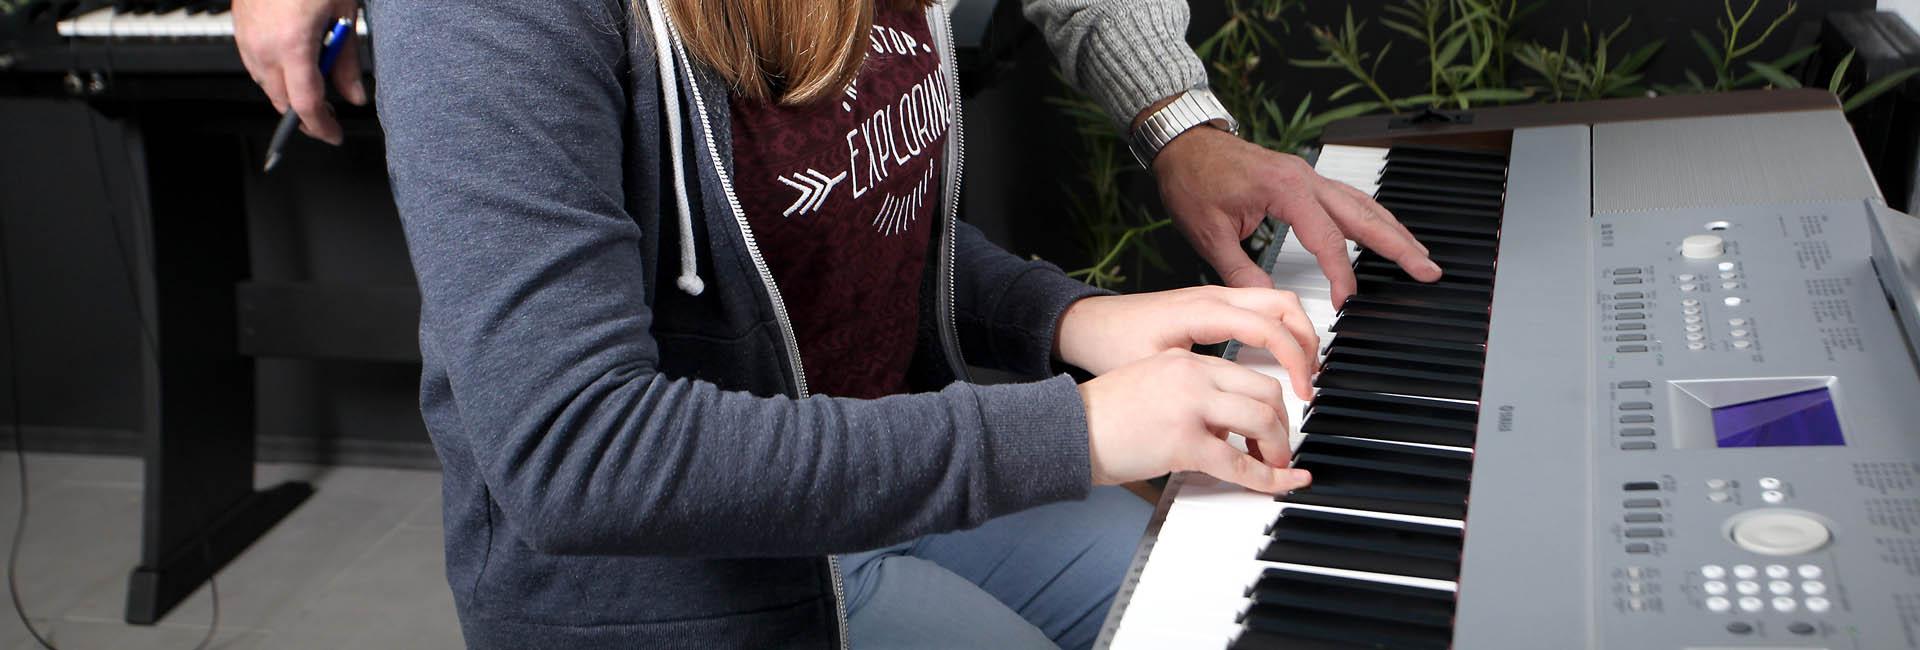 Musikschule in Alpirsbach Private Musikschule